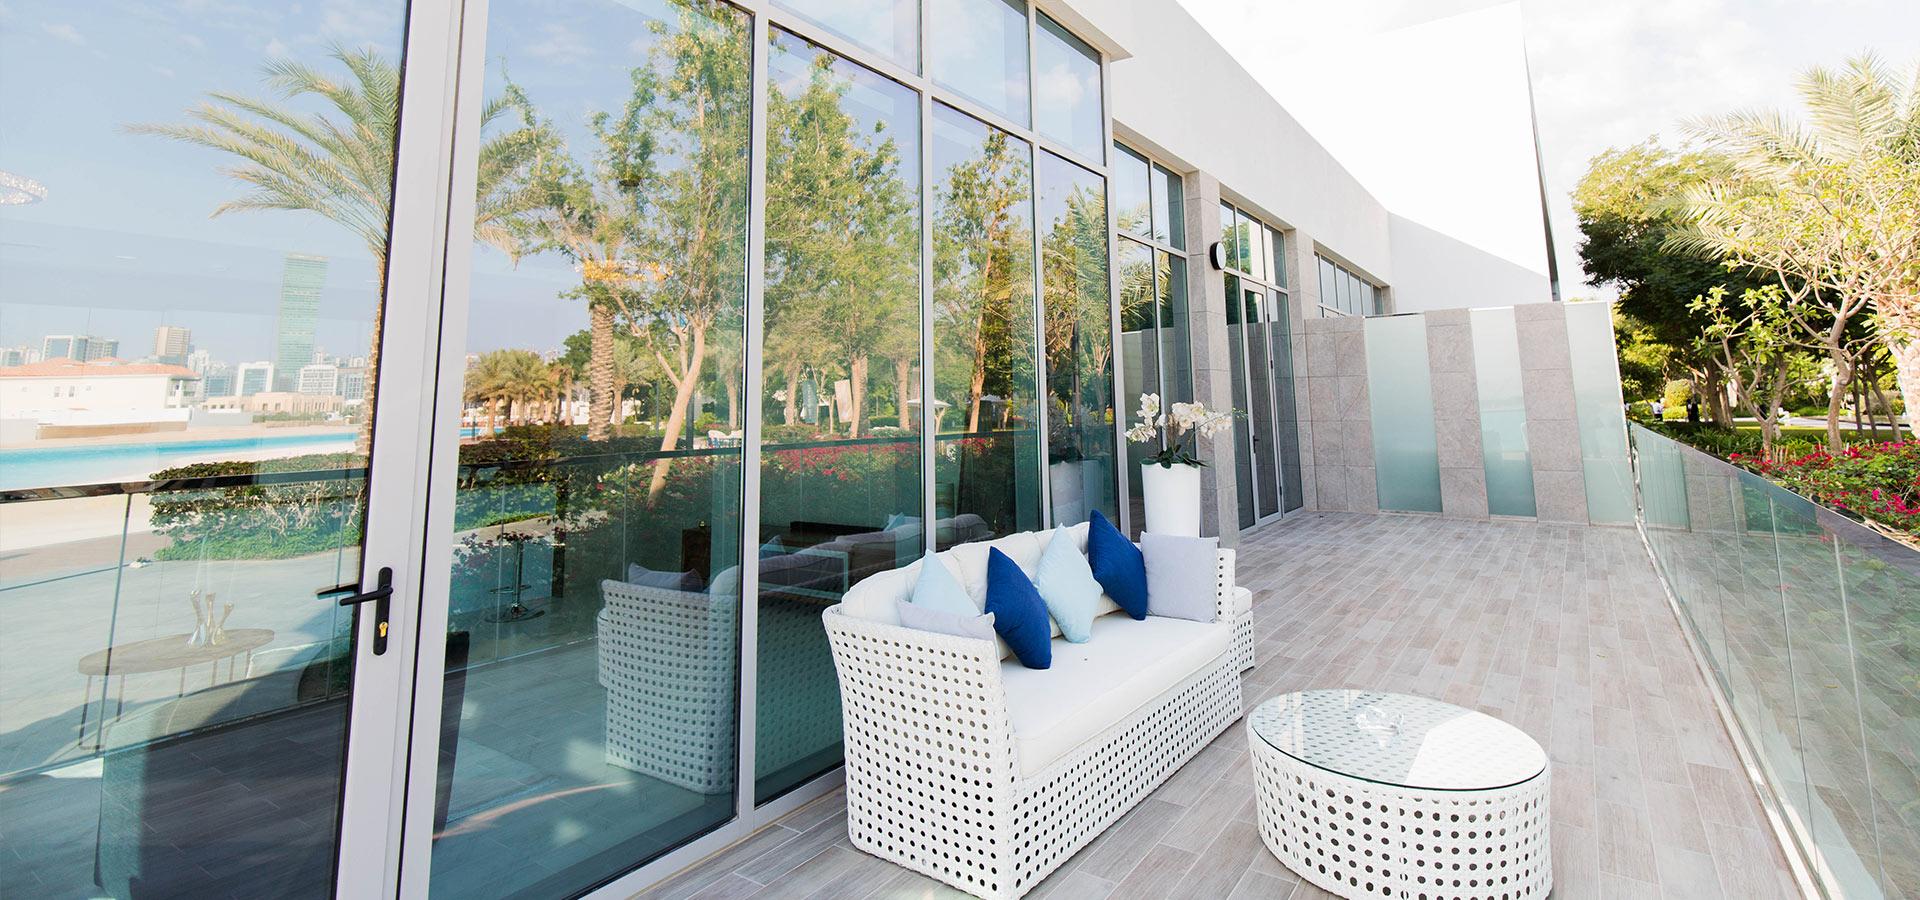 District One Residences, Meydan Sobha Group